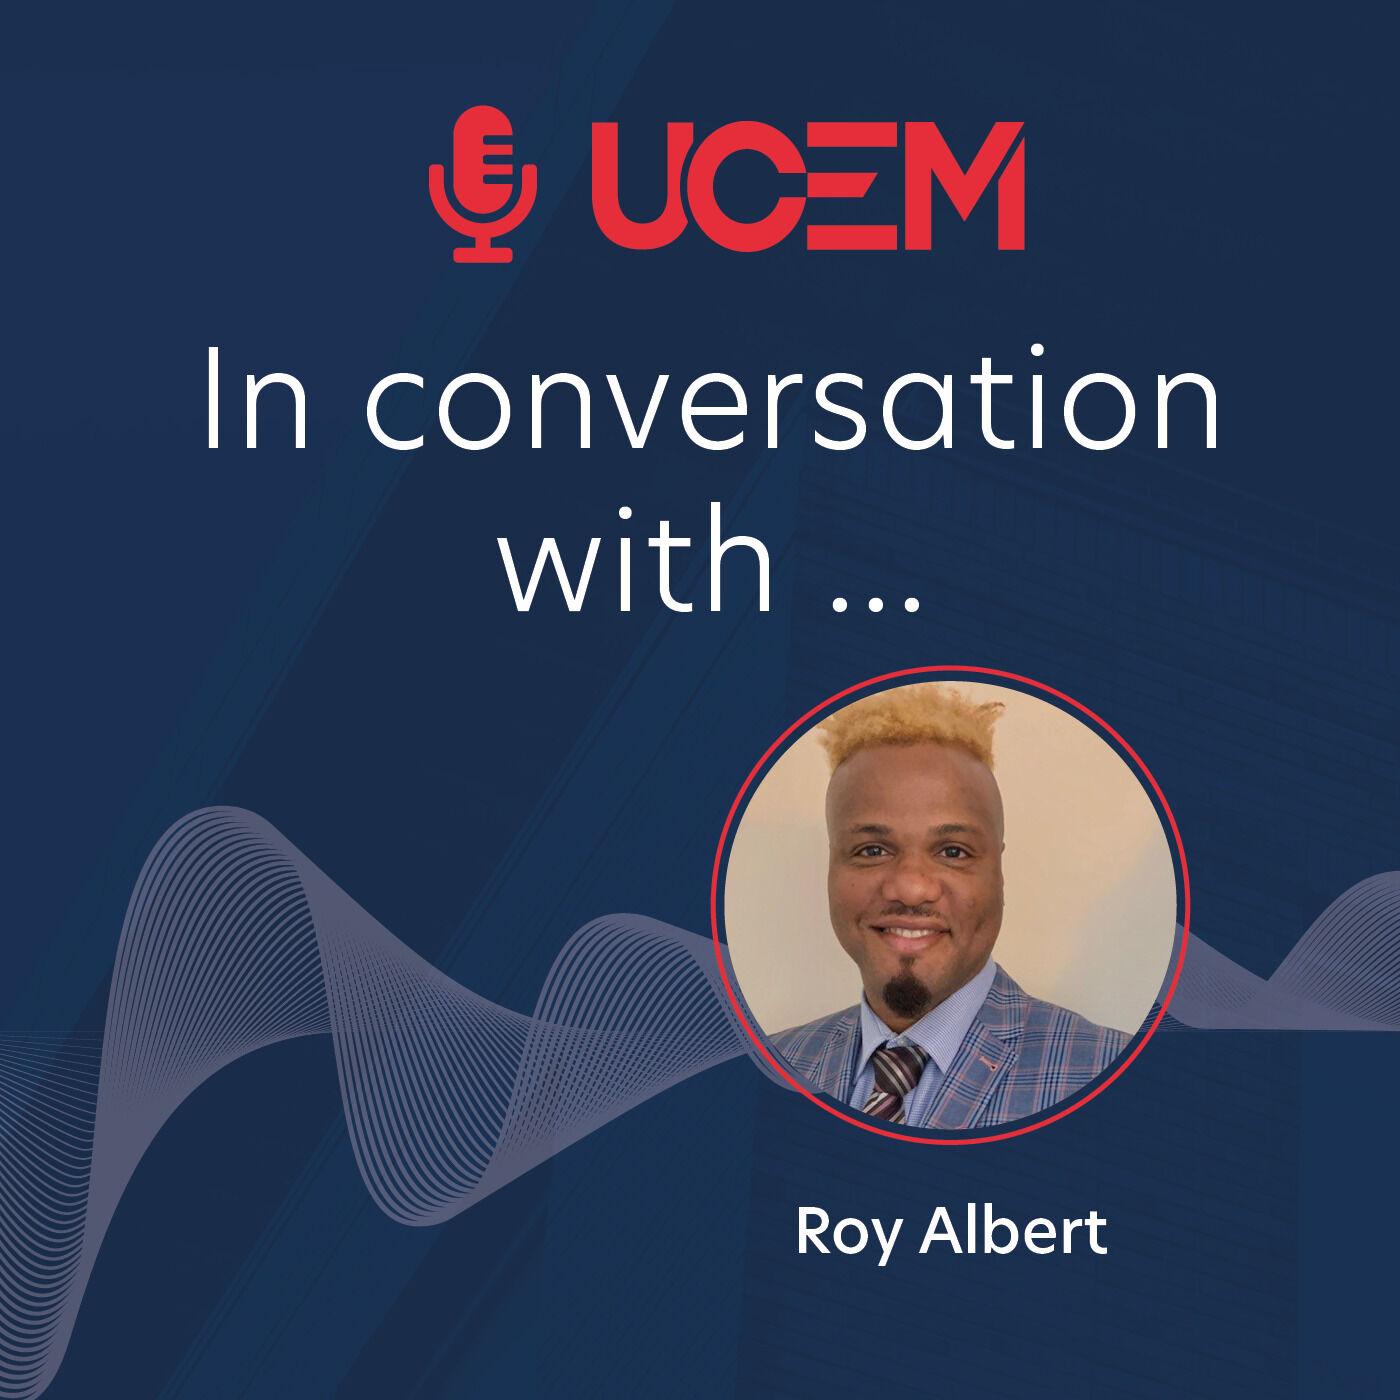 UCEM in conversation with... Roy Albert - Episode 7